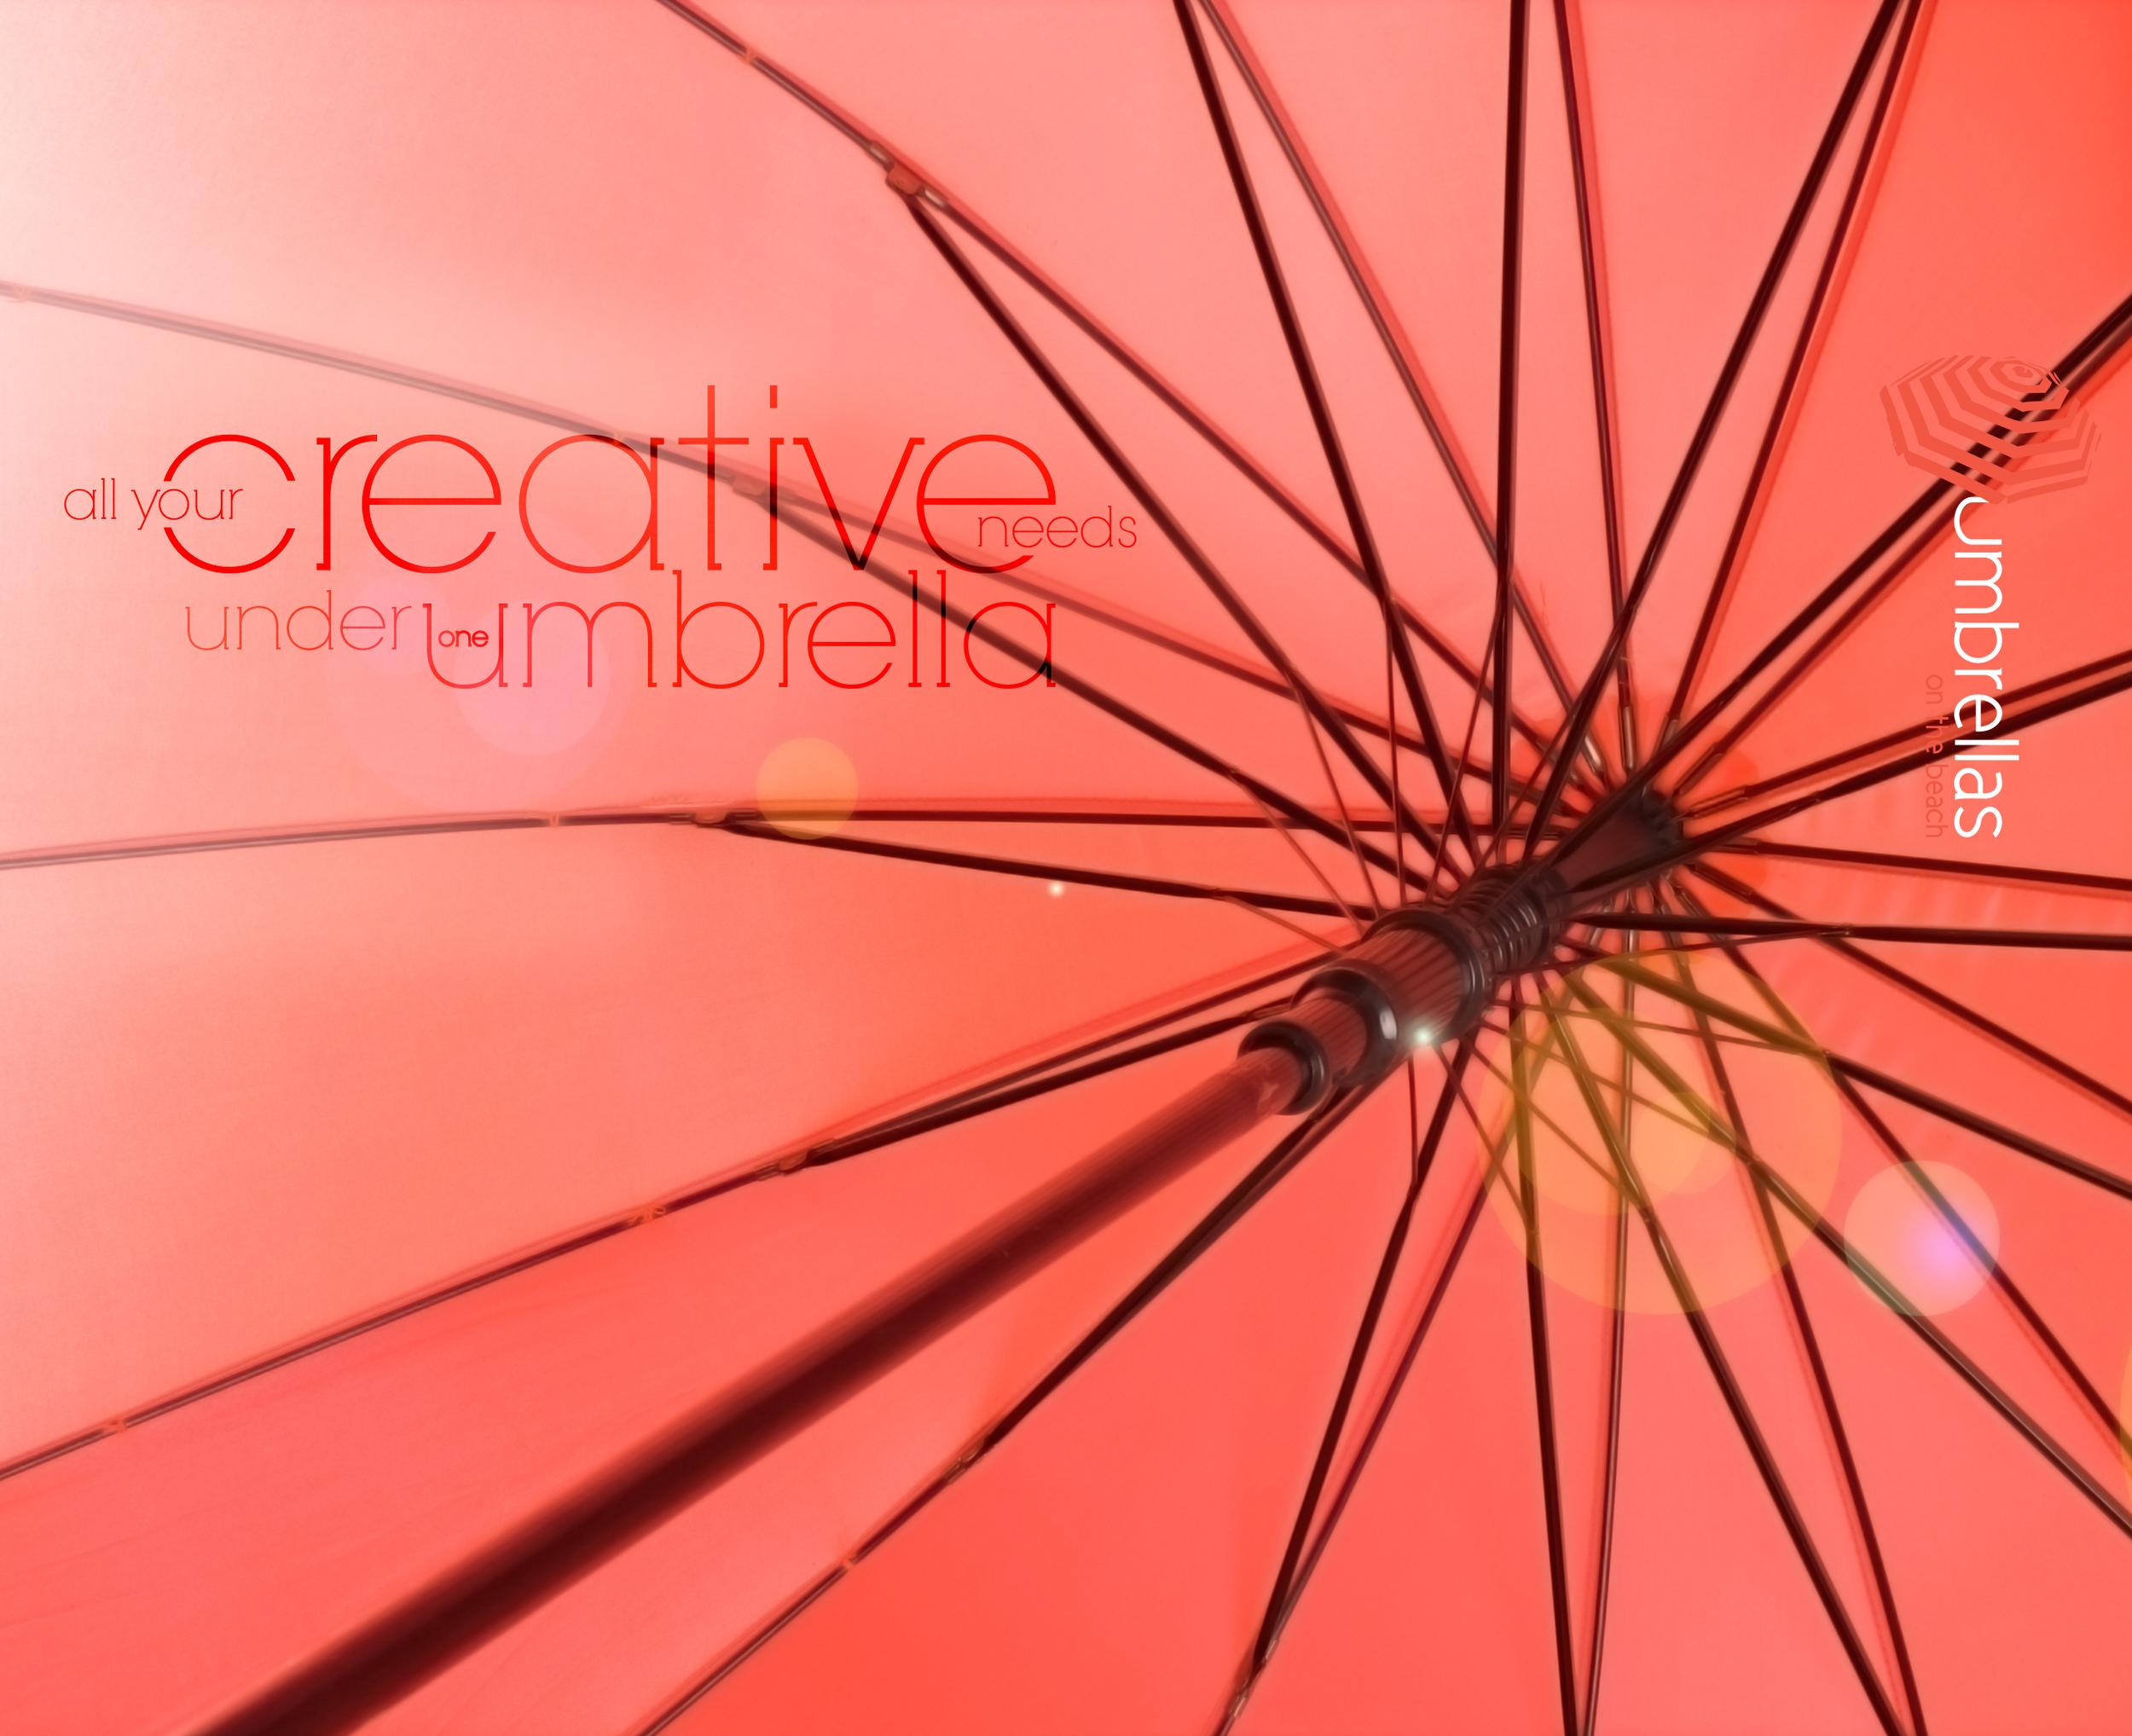 uotb rotating images v2_0006_umbrella.jpg